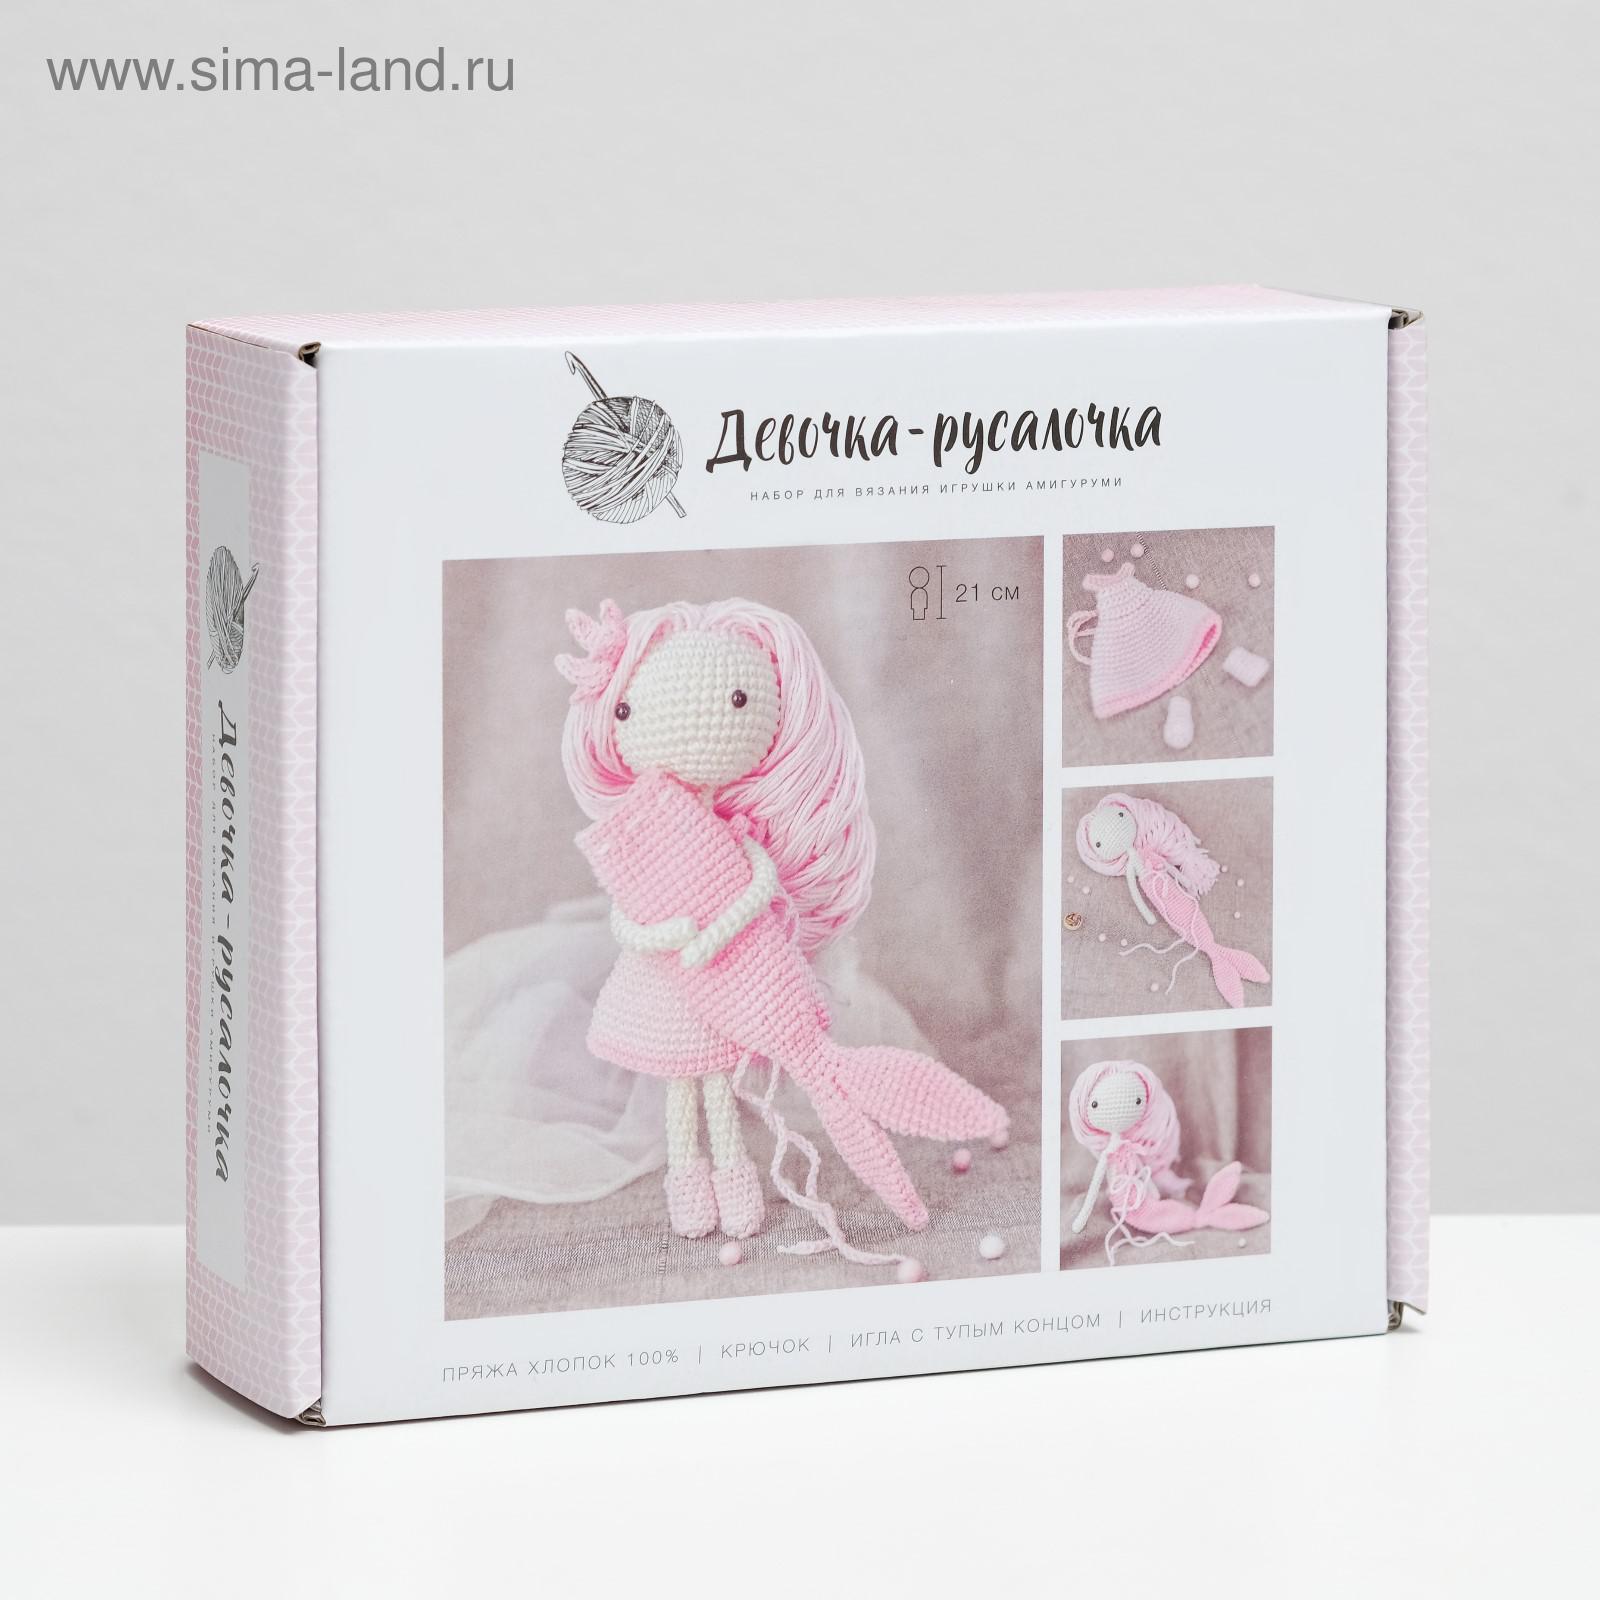 амигуруми мягкая игрушка девочка русалочка набор для вязания 10